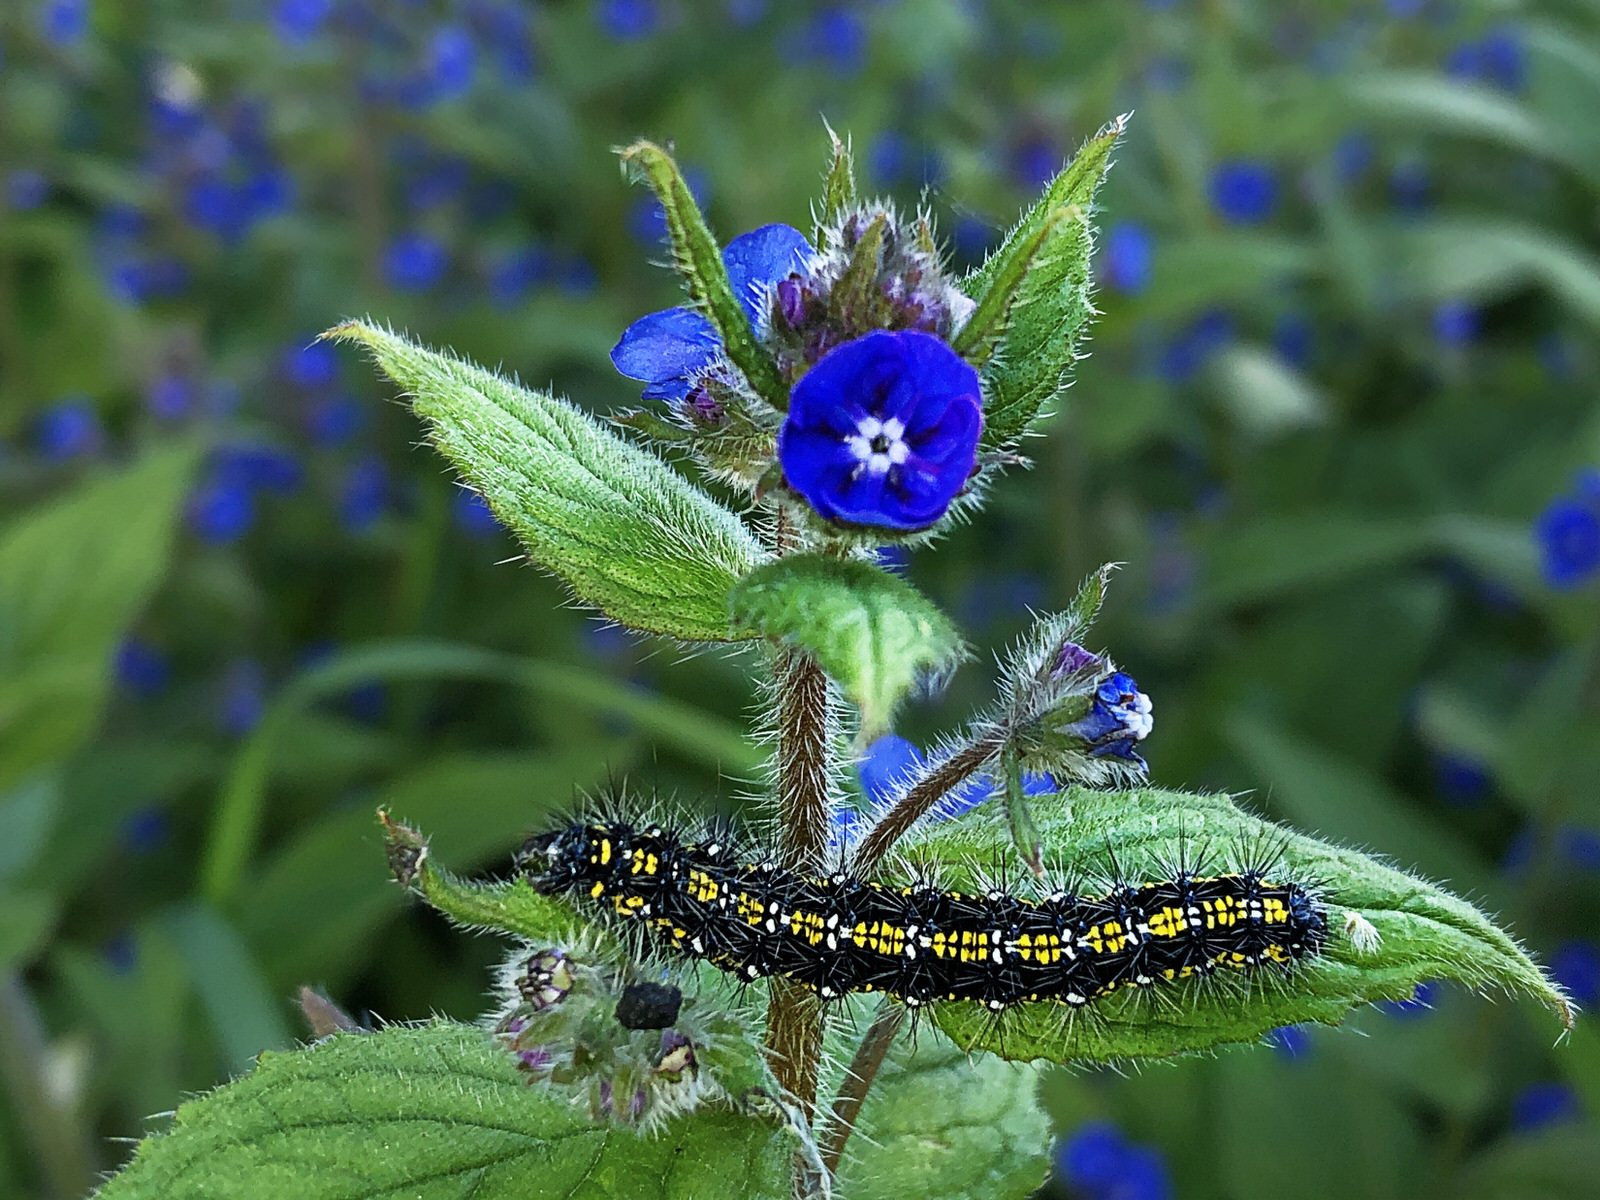 Vivid striped caterpillar on Sweet Nettle flower